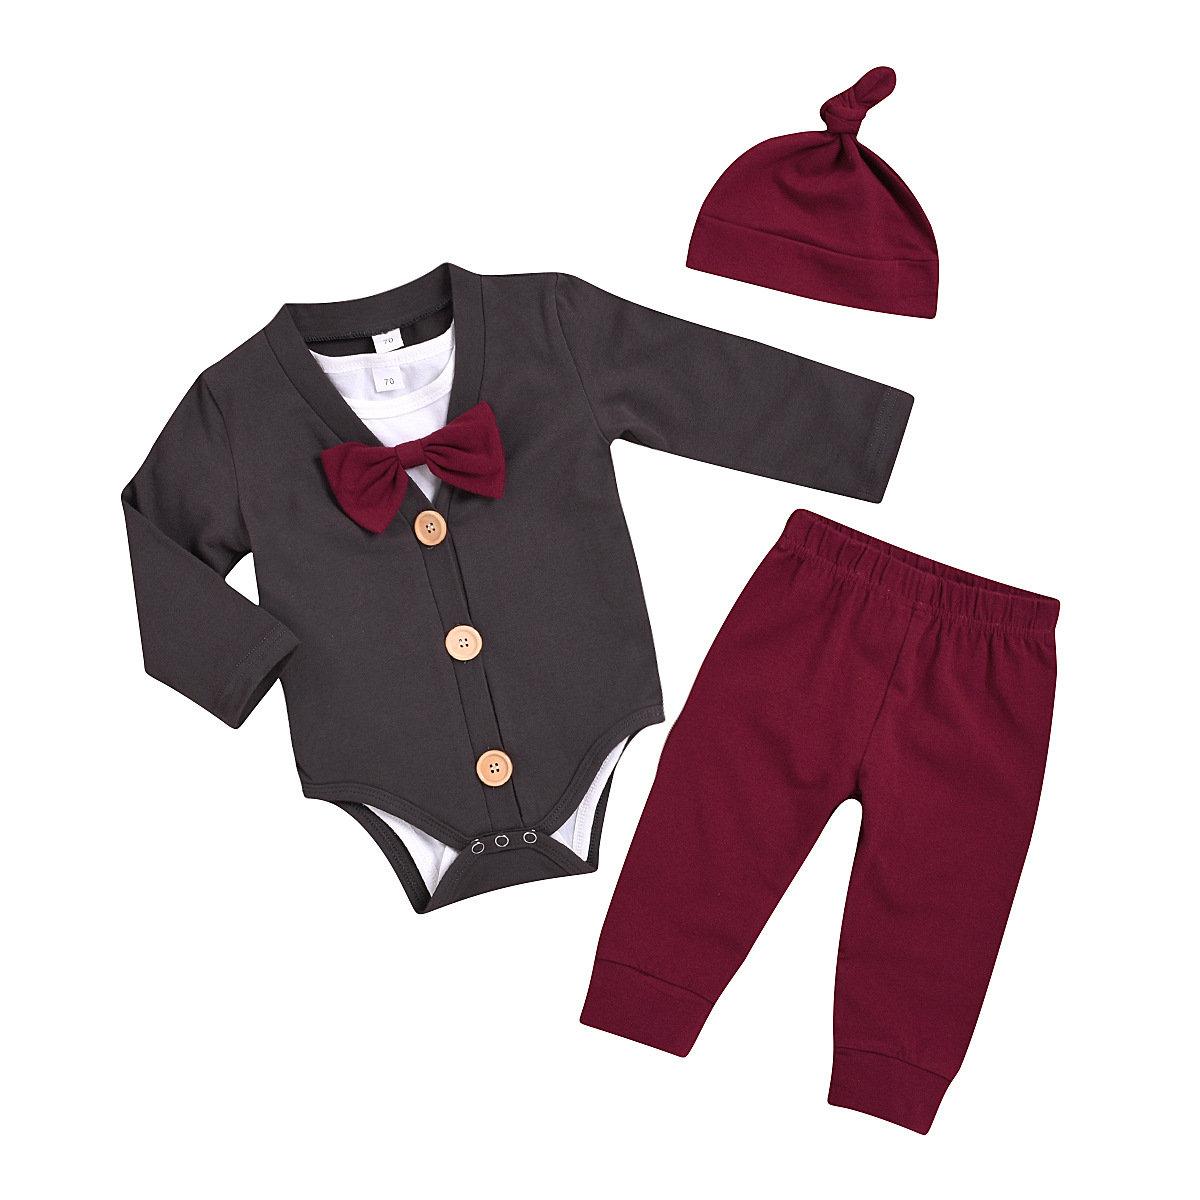 4PCs Baby Boys Gentleman Long Sleeves Rompers Set For 0-24M